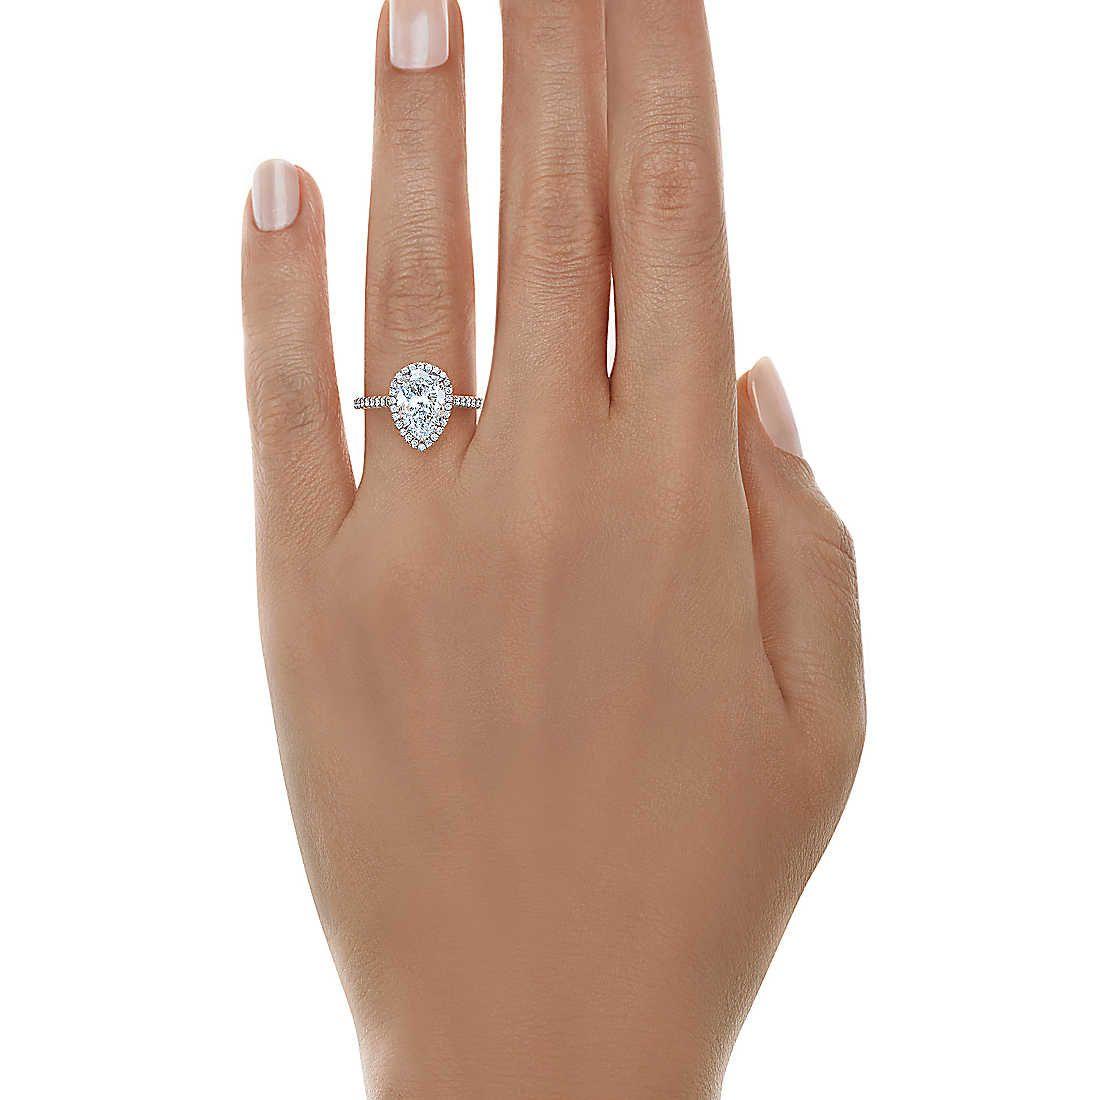 0967ef9eb Tiffany Soleste® Pear Shape Halo Engagement Ring with Diamond Band ...